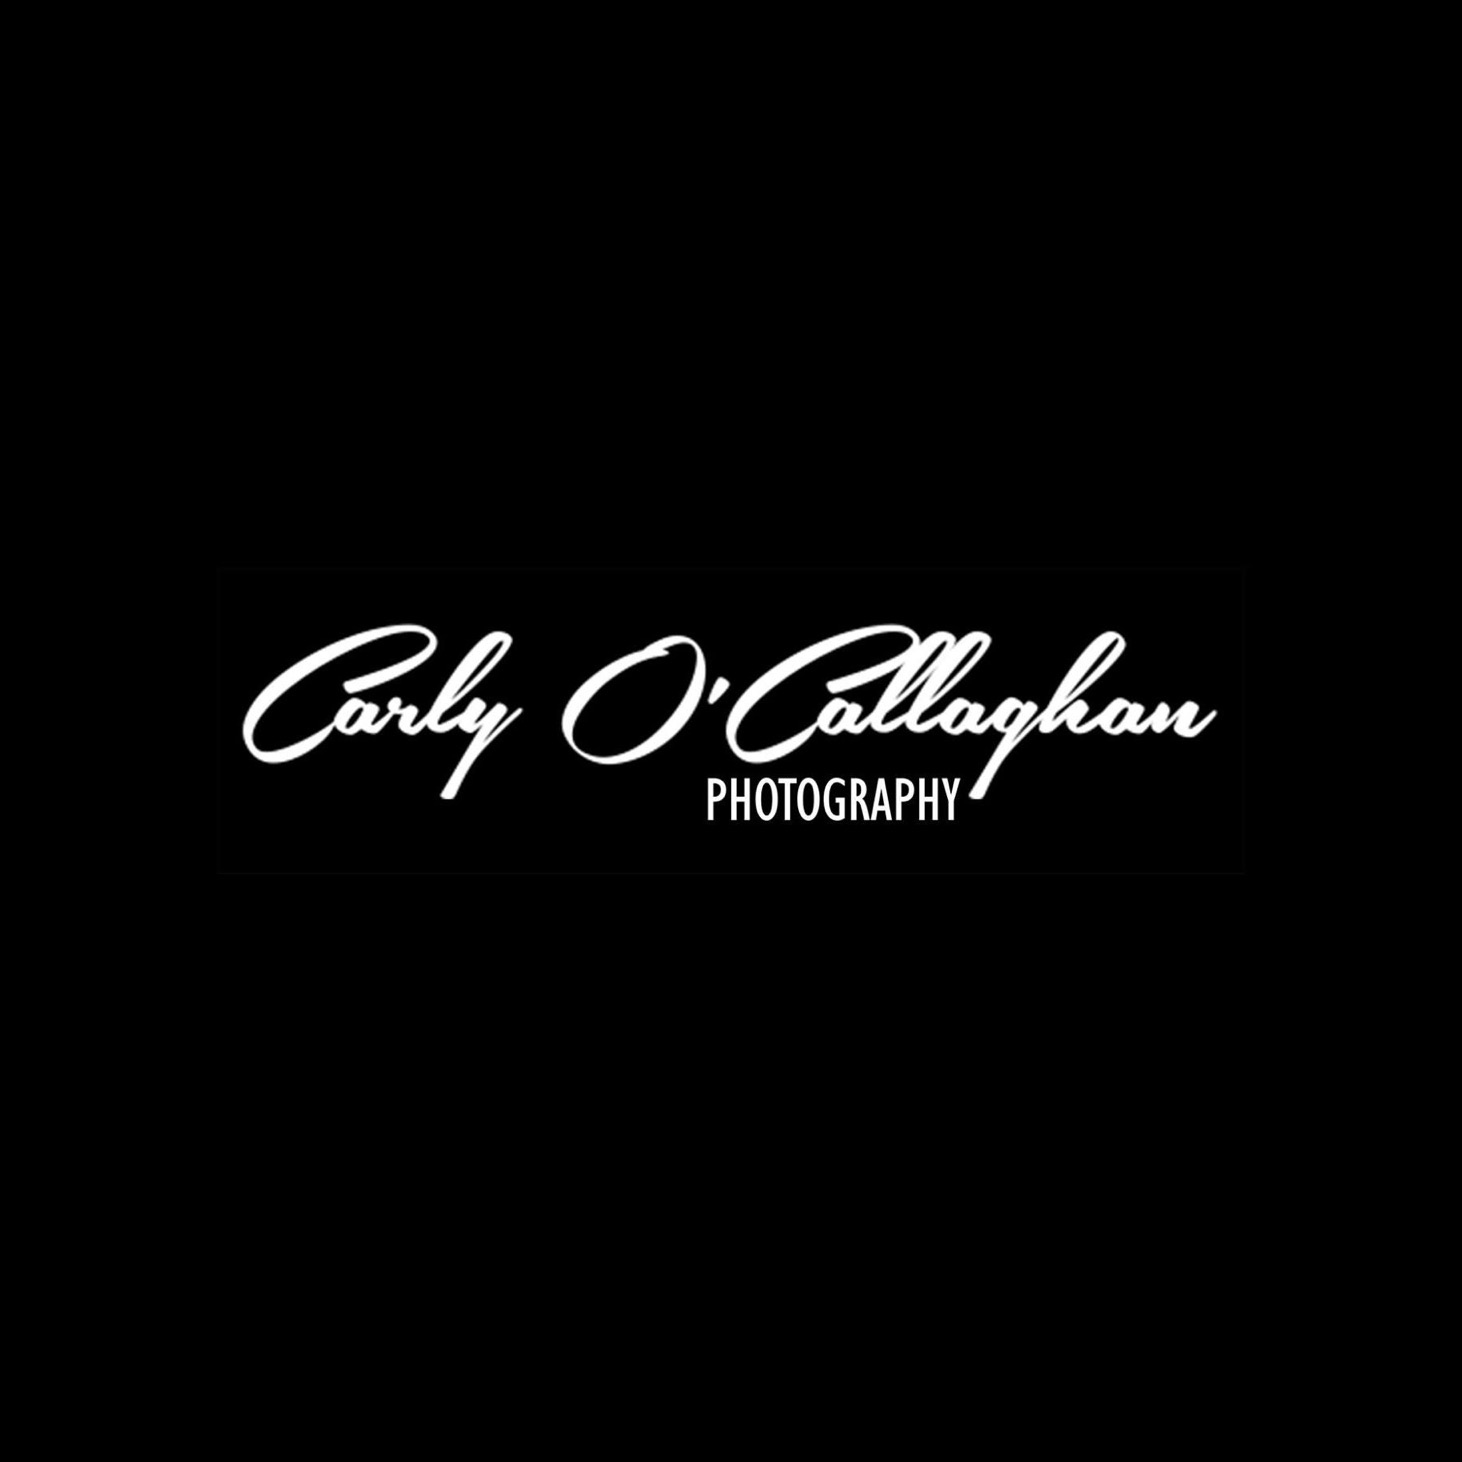 Carly O'Callaghan Photography